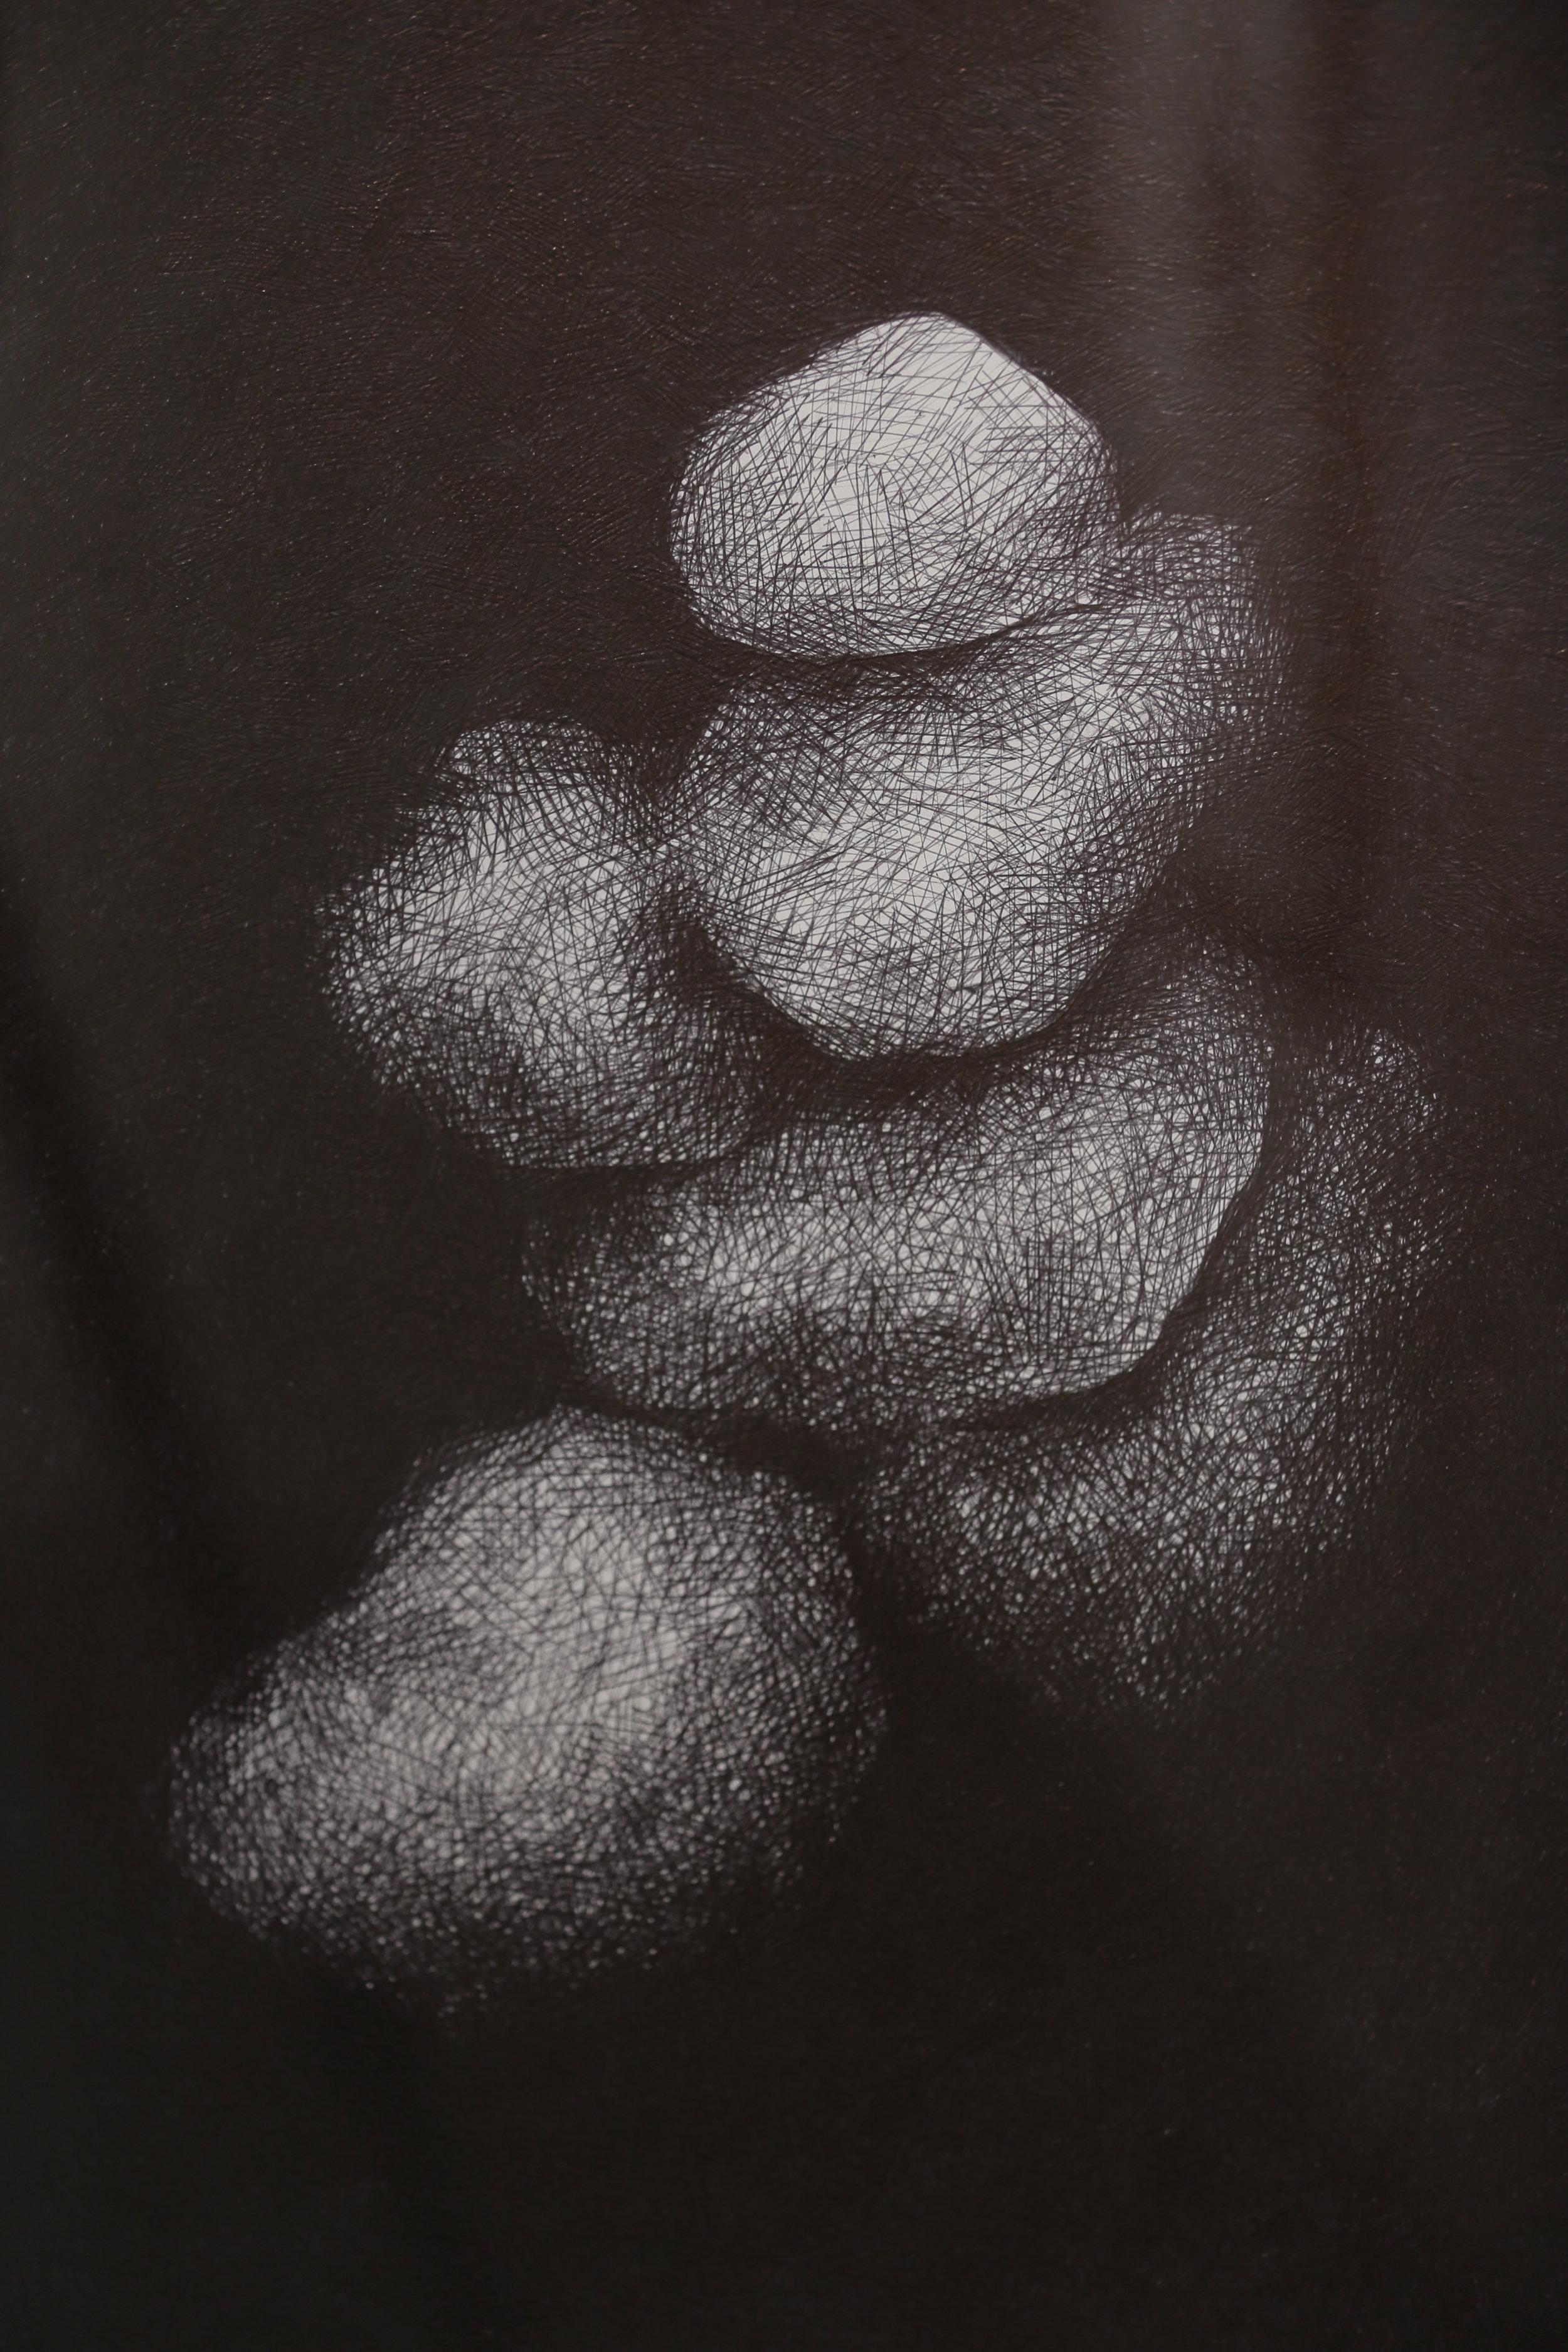 Untitled (detail), biro on watercolour paper, 1m x 75cm, 2016